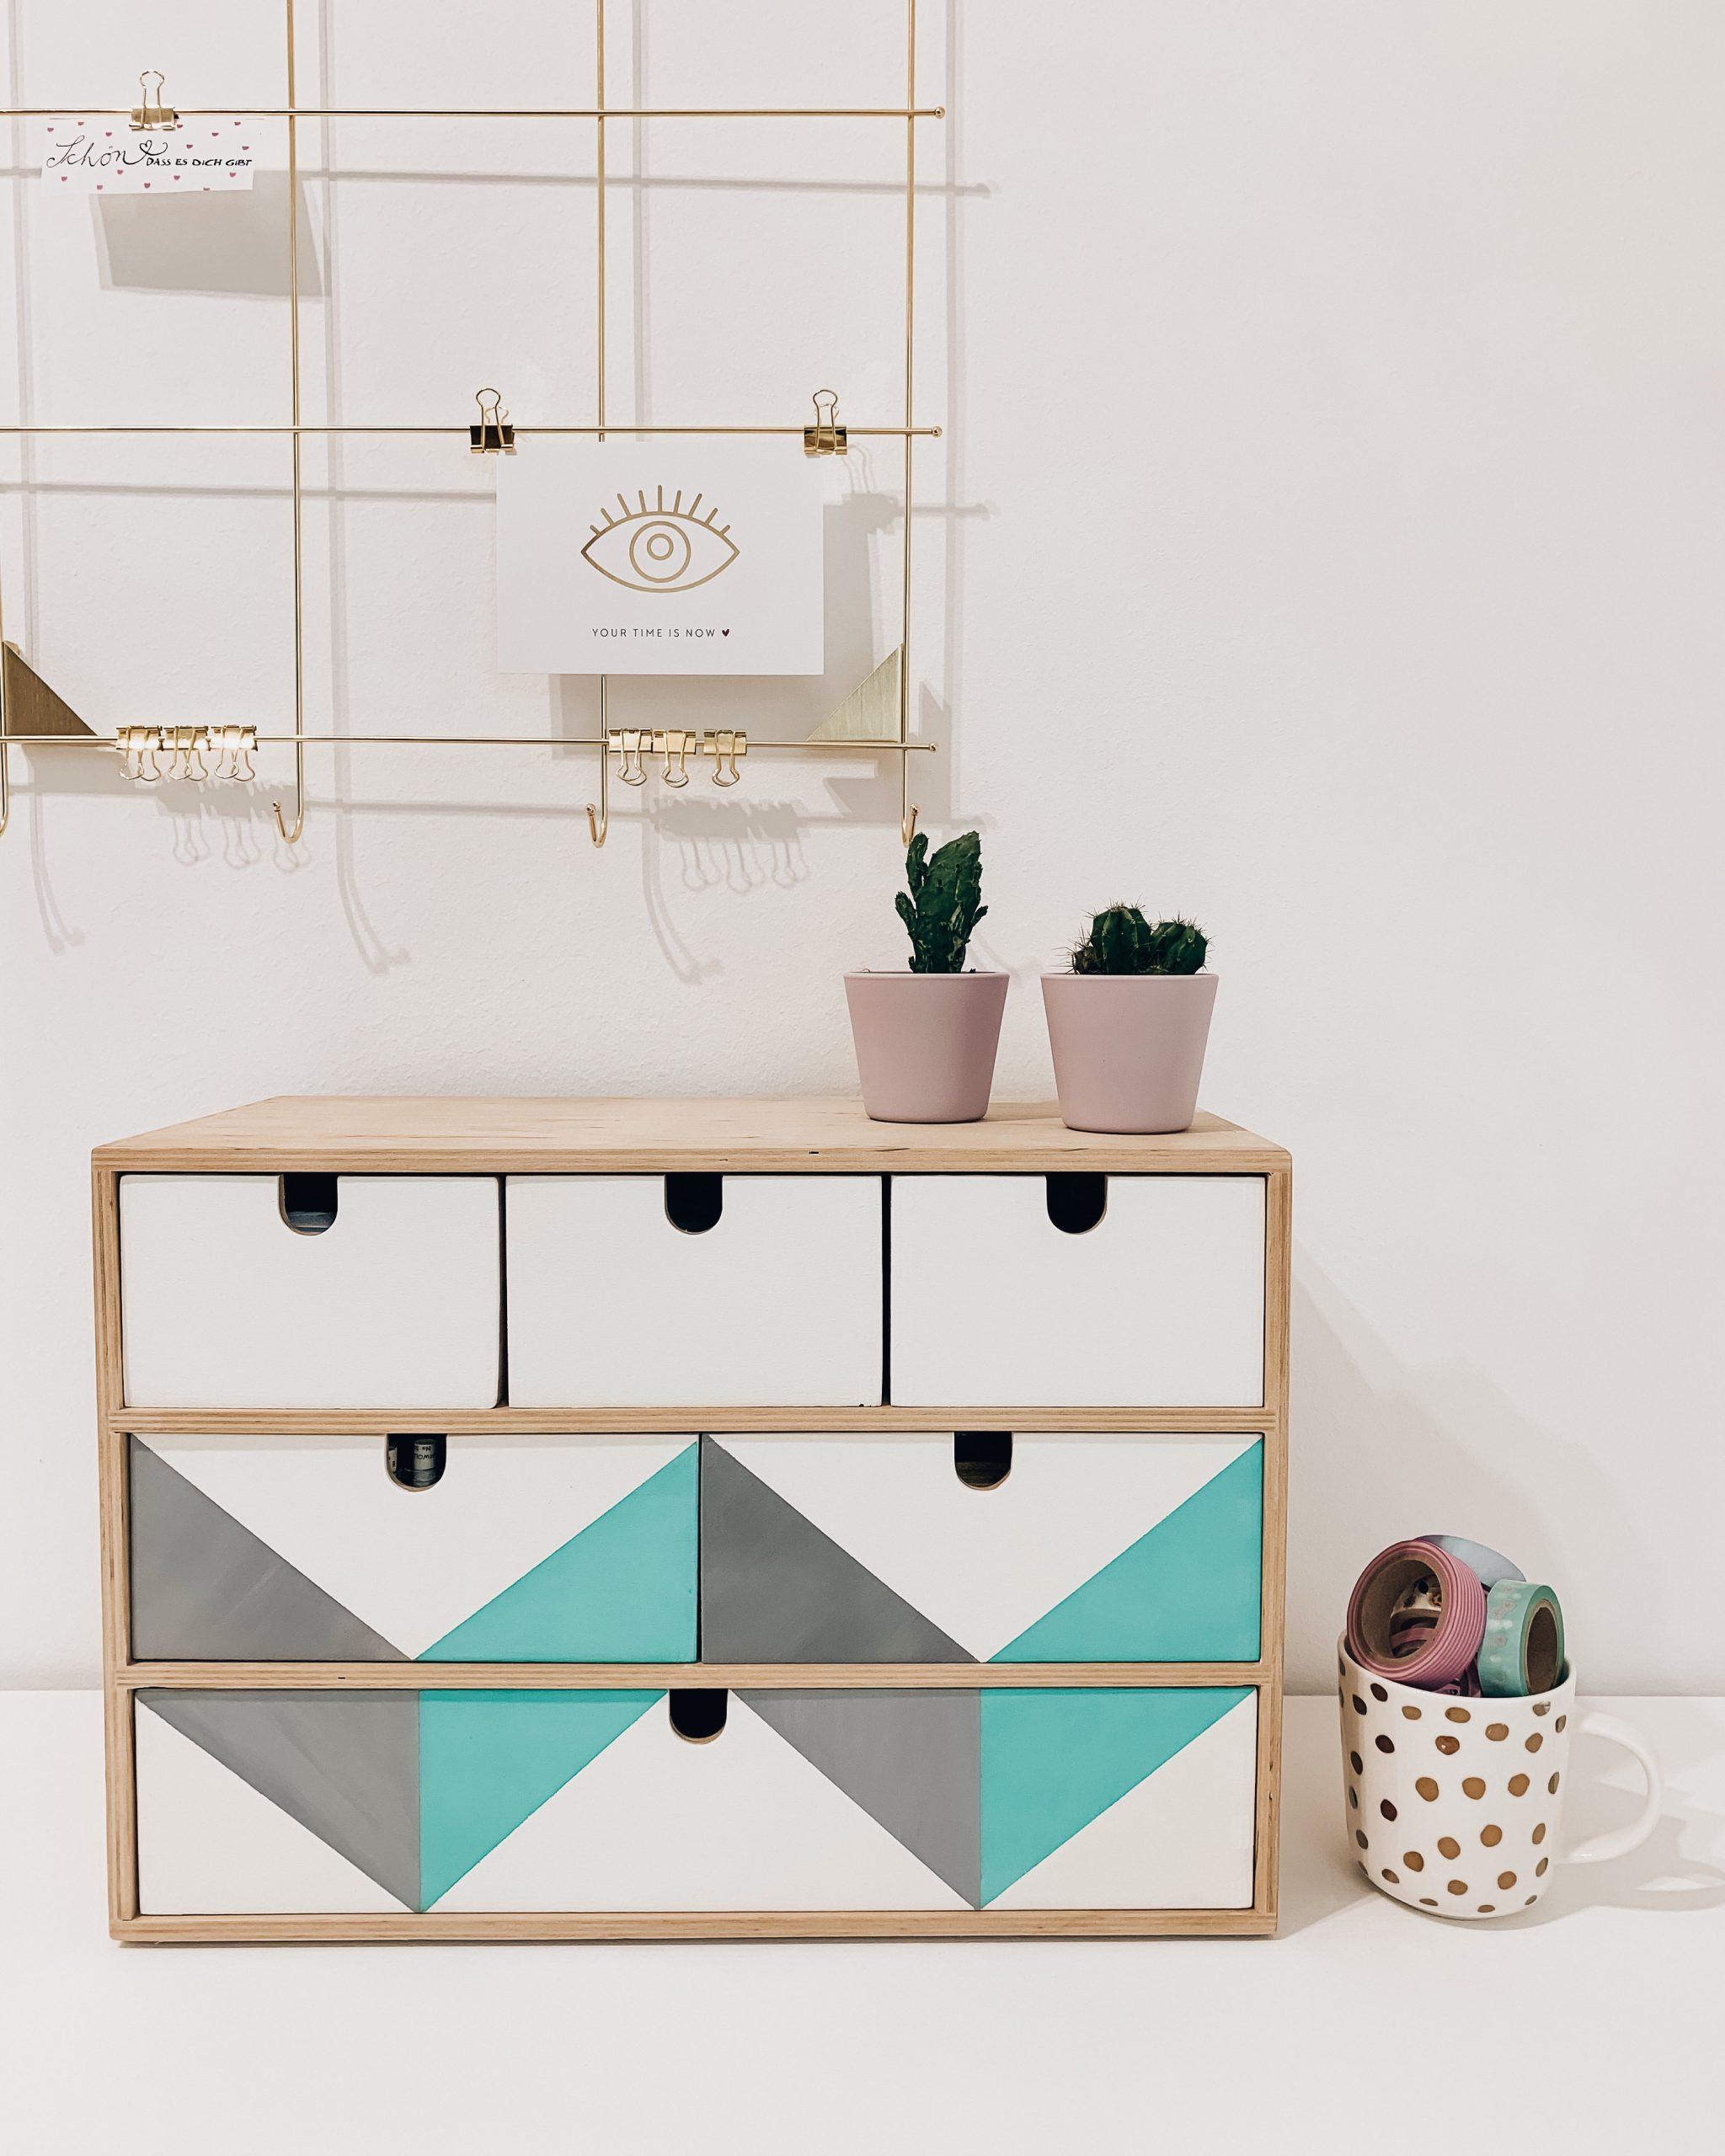 IKEA Hack - Ikea Moppe Hack Mini Kommode - Mini Kommode umgestalten - Kommode bemalen mit Kreidefarbe und Acrylfarbe - DIY - Interieur DIY - Fashionladyloves by Tamara Wagner